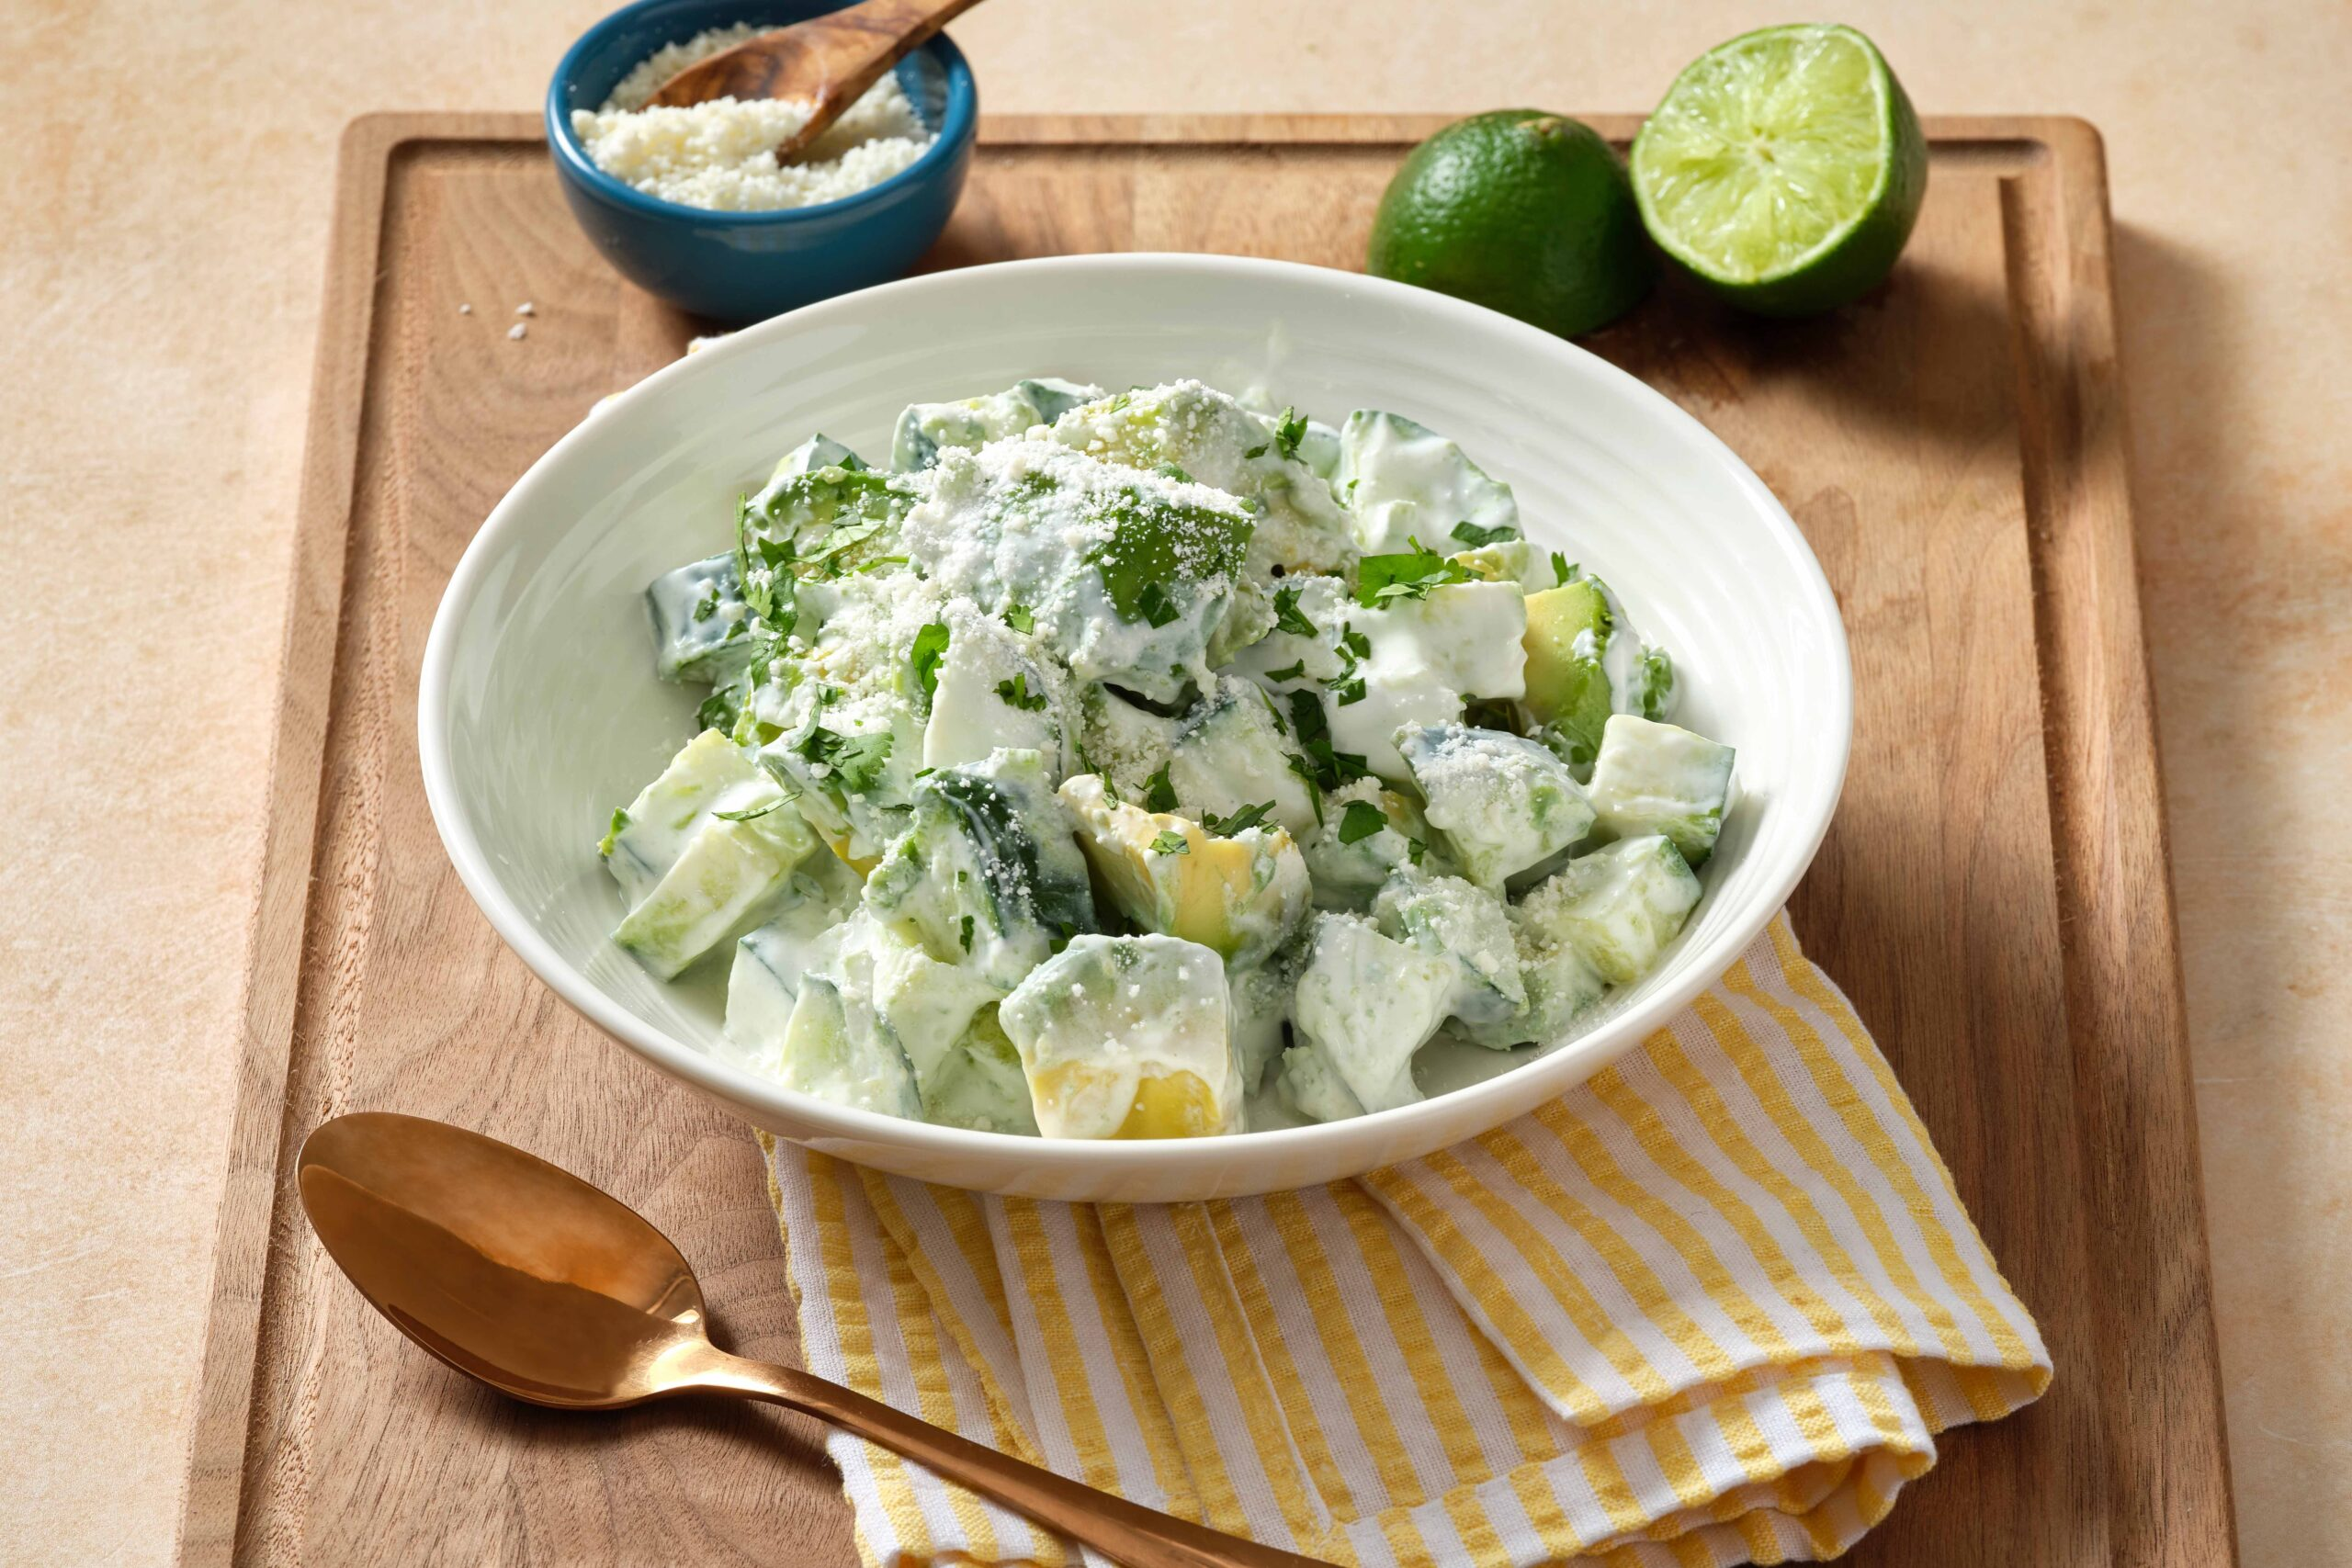 Avocado and Cucumber Salad